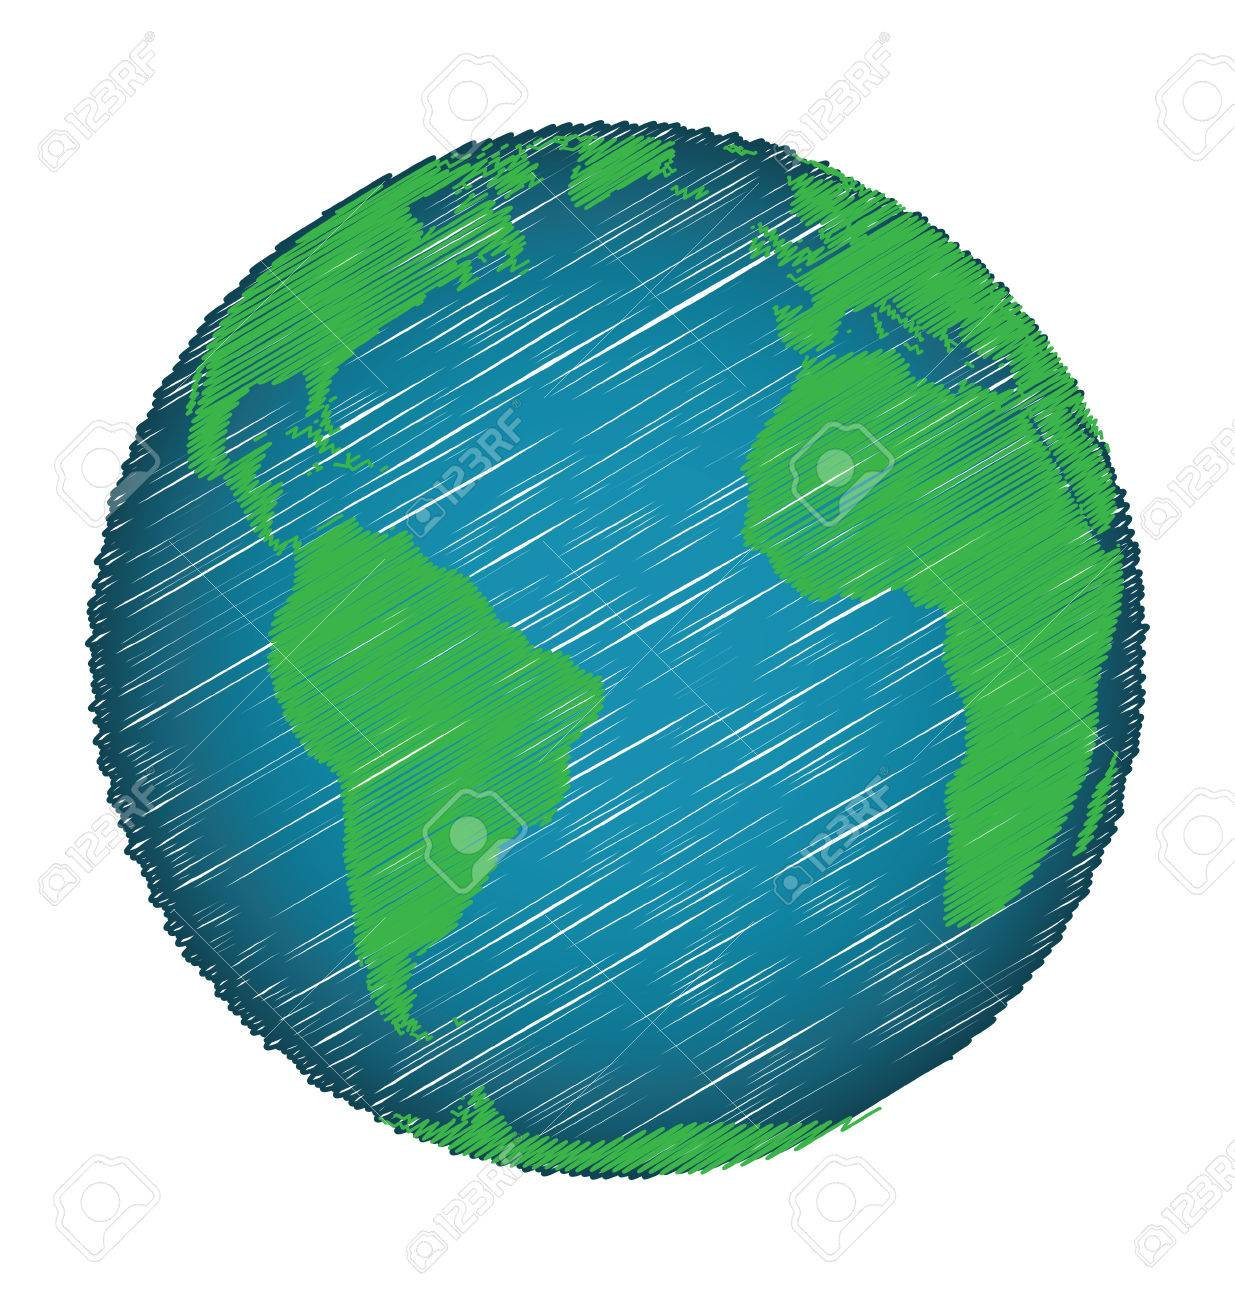 Earth Sketch Hand Draw Credit World Map Of Nasa Royalty Free